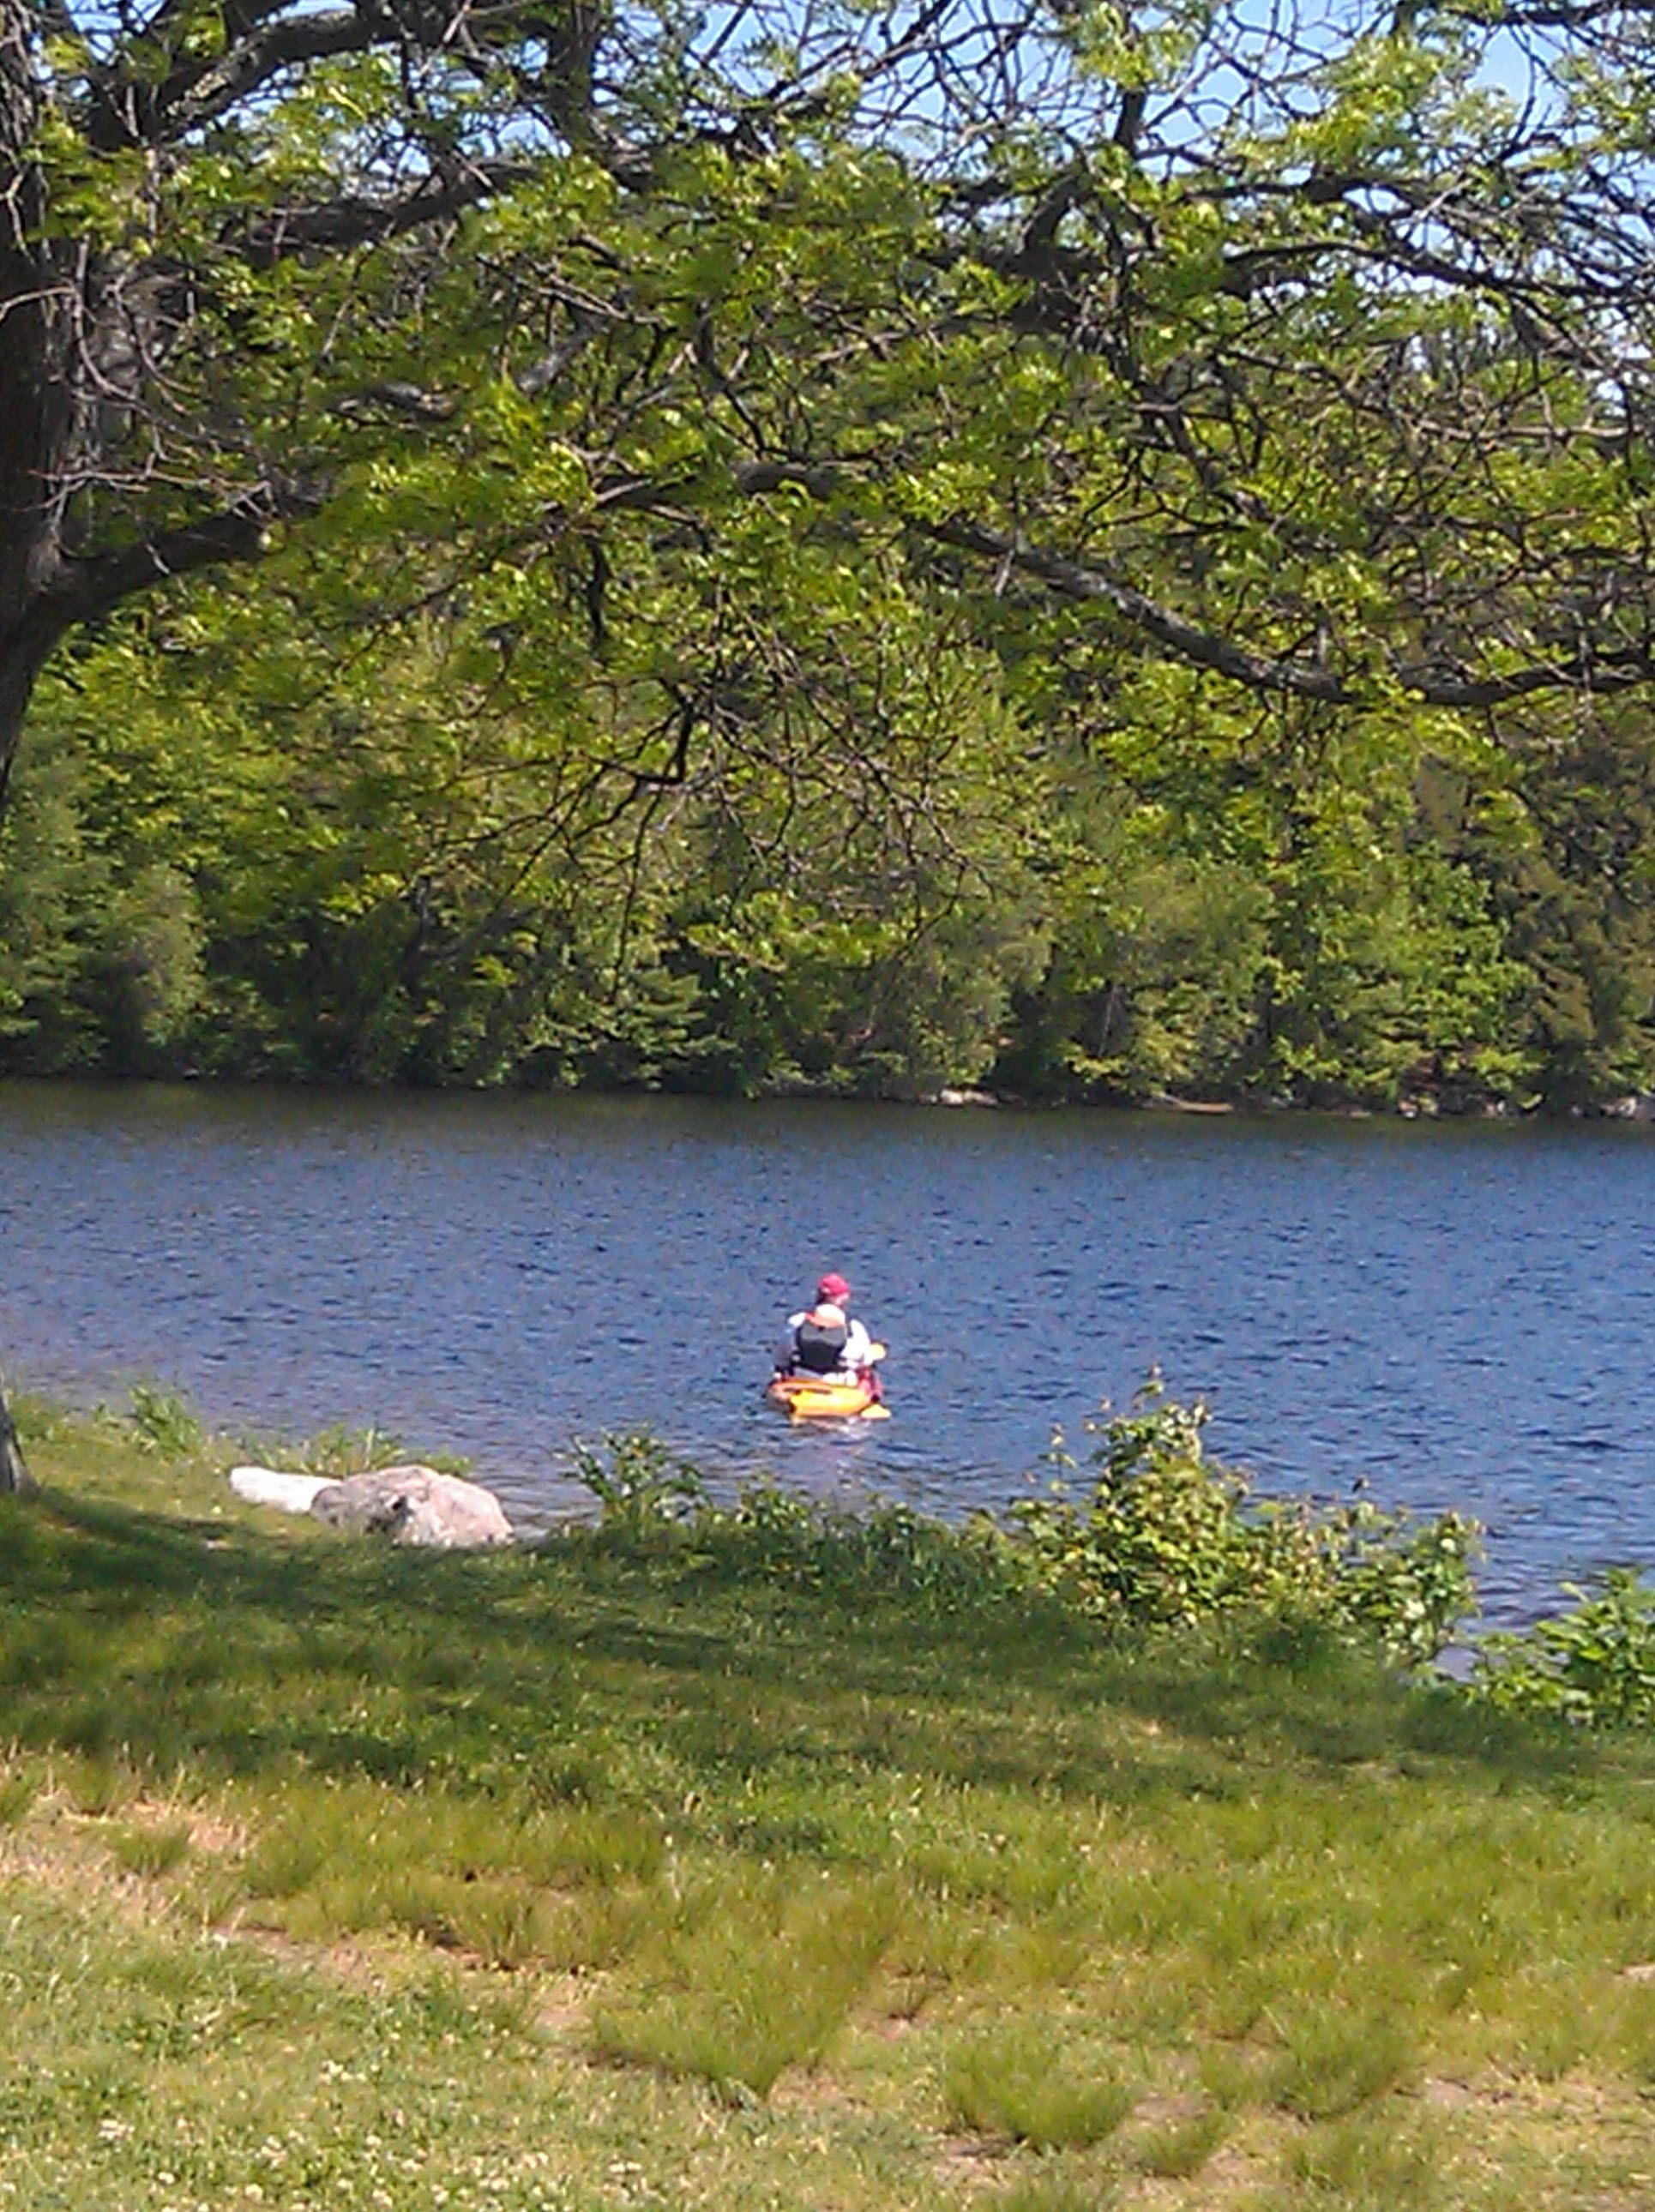 Massabesic Lake | Massabesic Lake in Manchester, NH